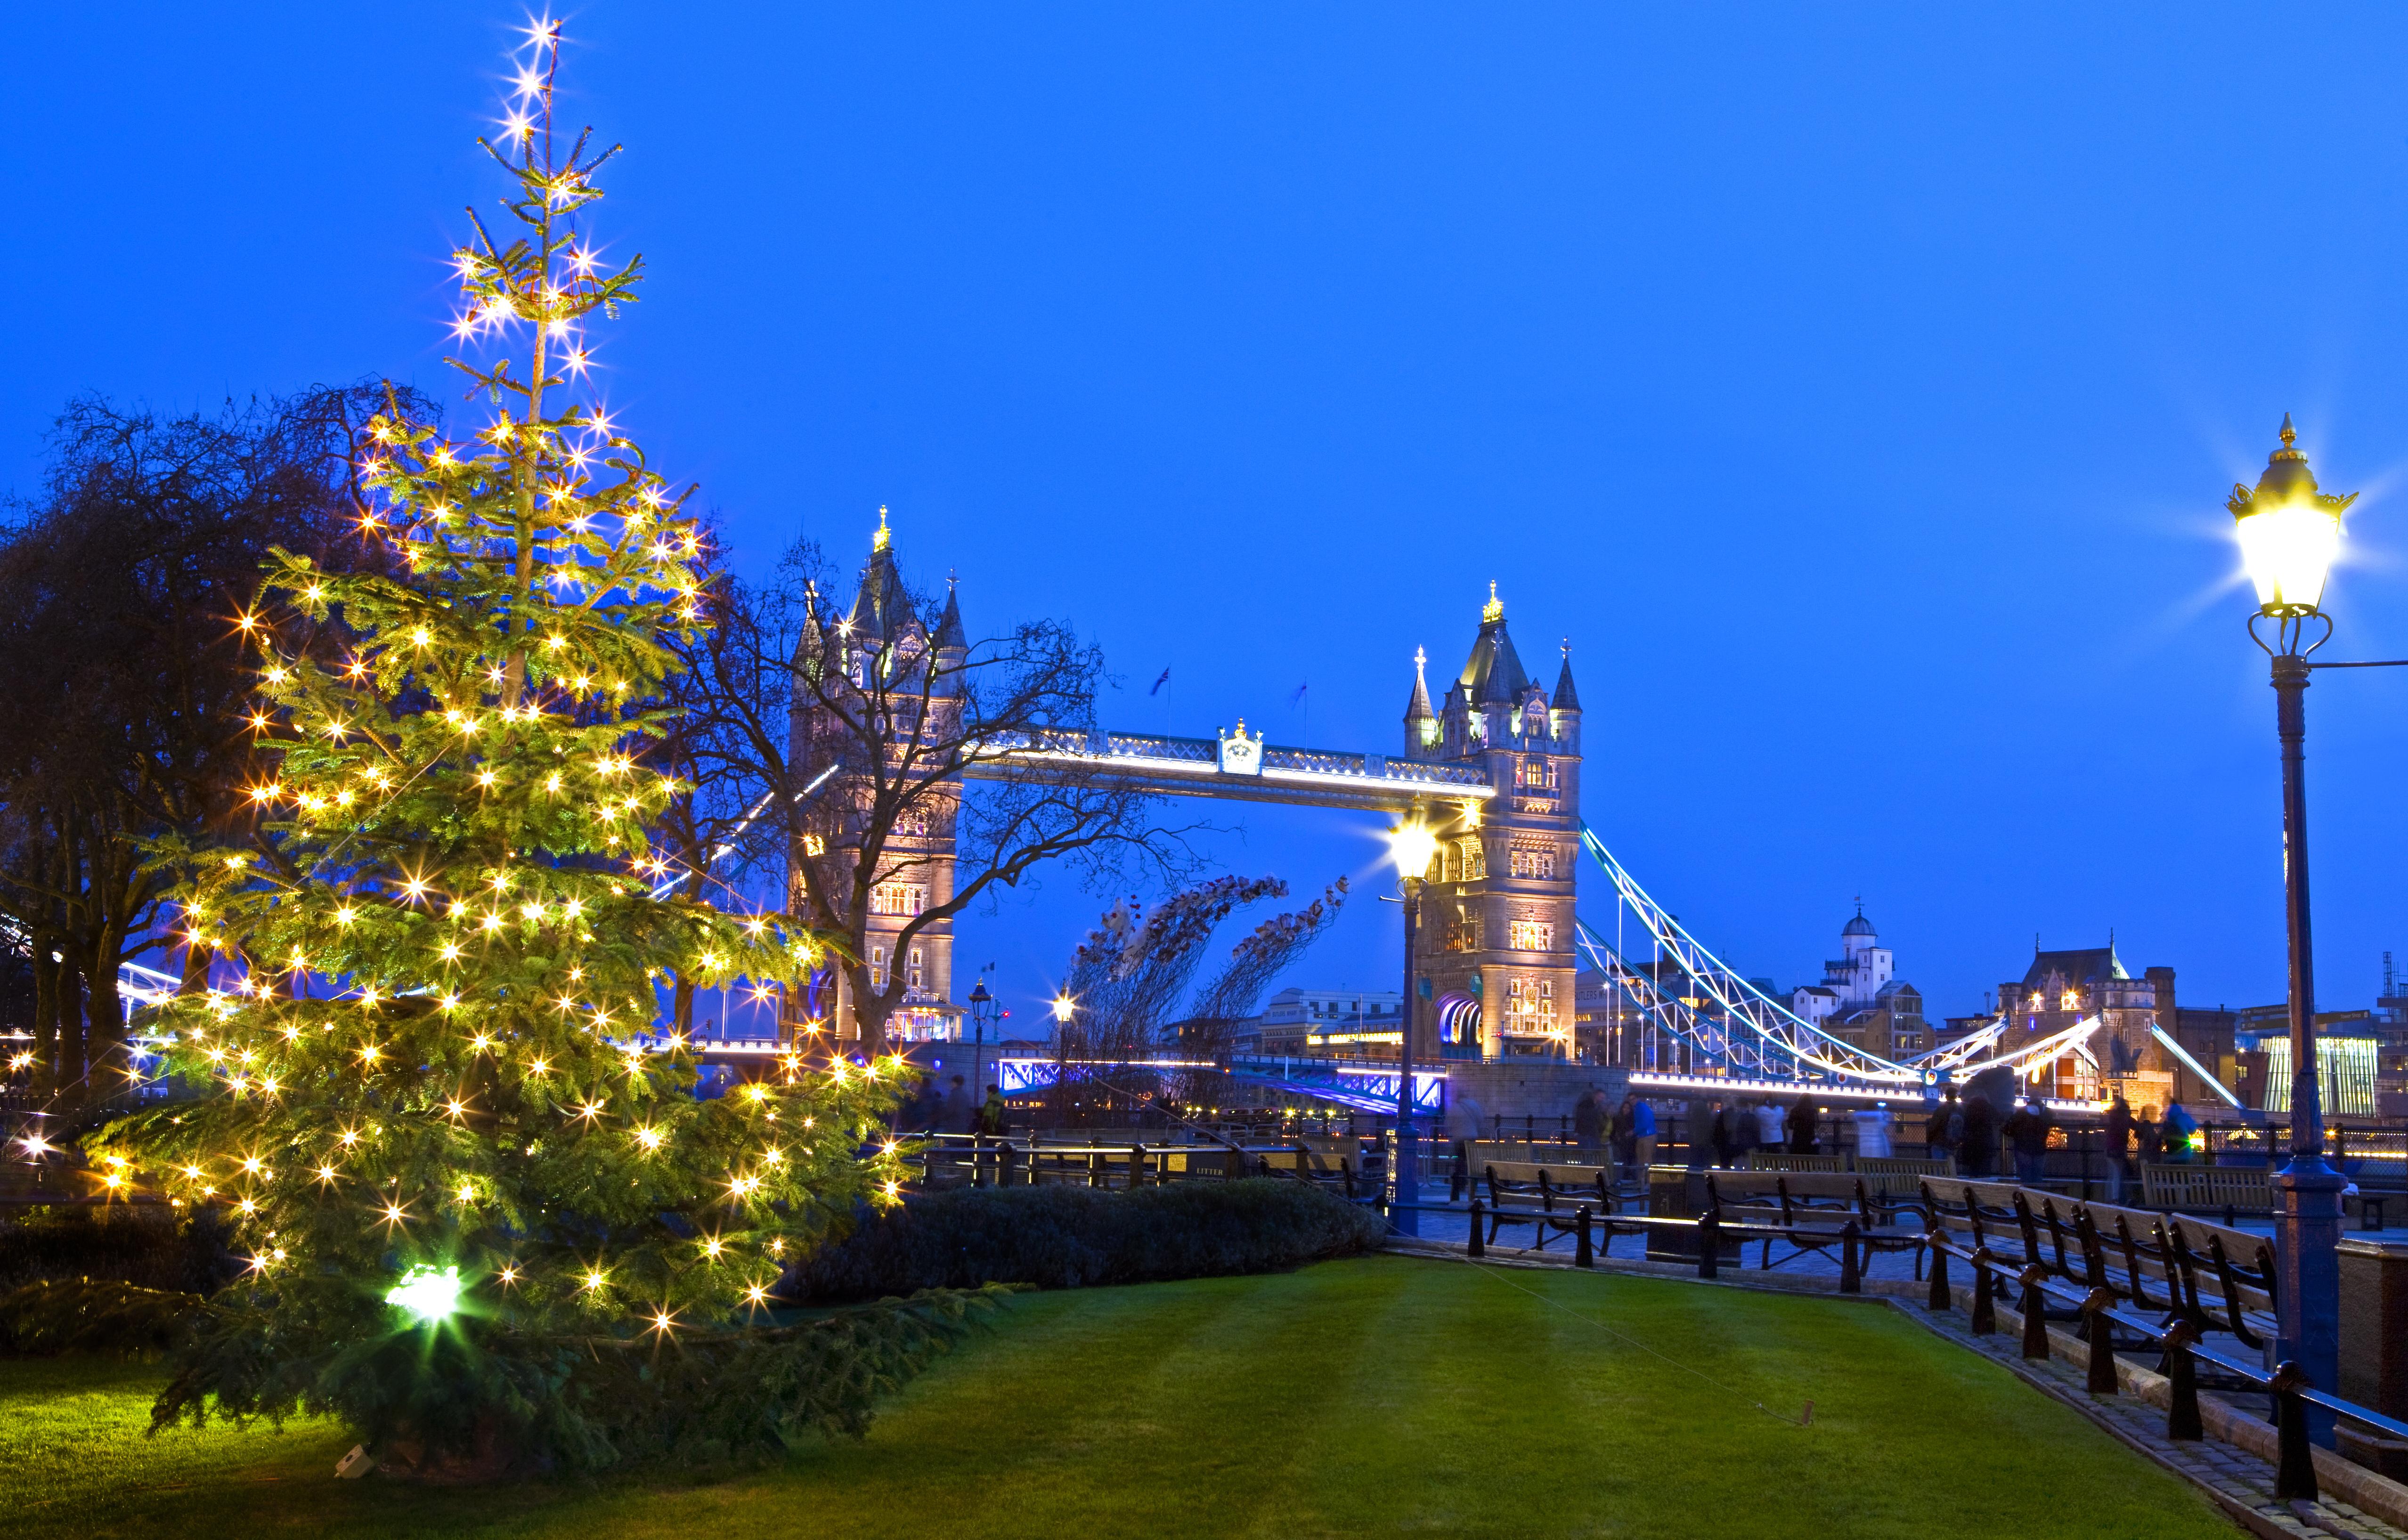 https://assets.eberhardt-travel.de/2018/Grossbritannien/59778_Tower_Bridge_London_Original.jpg